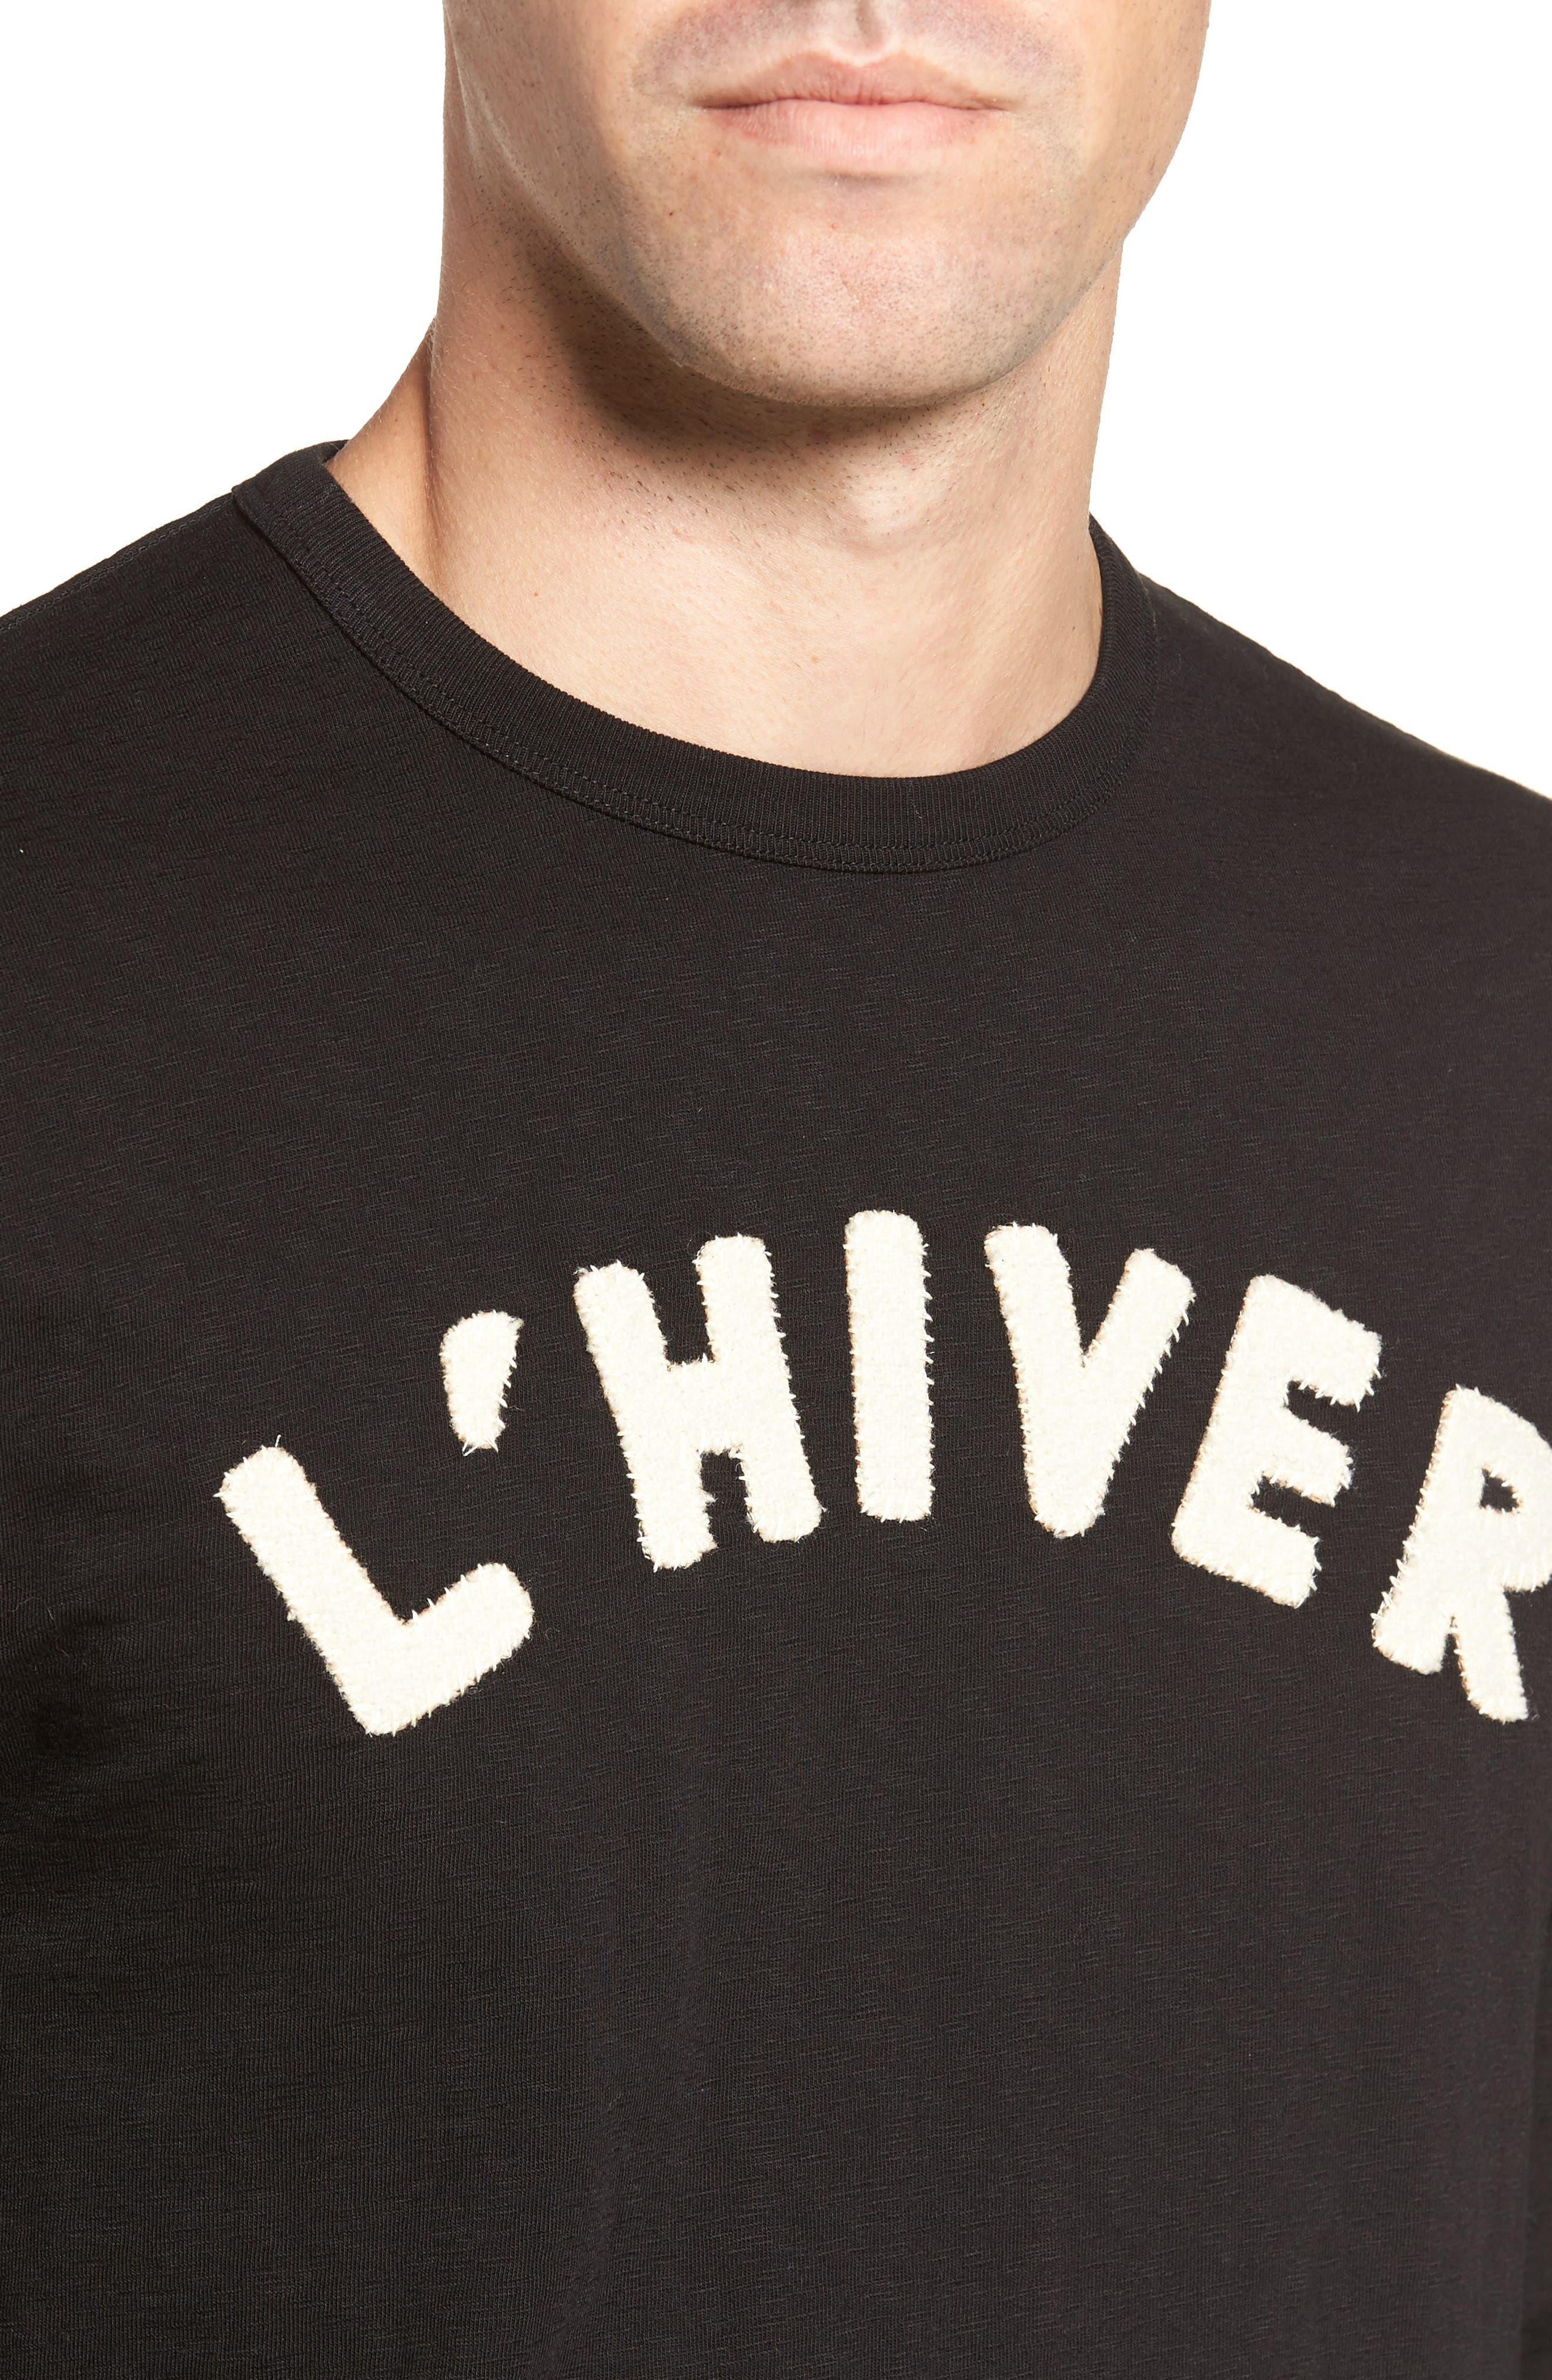 L'Hiver Regular Fit Long Sleeve T-shirt,                             Alternate thumbnail 4, color,                             Black/ Clay